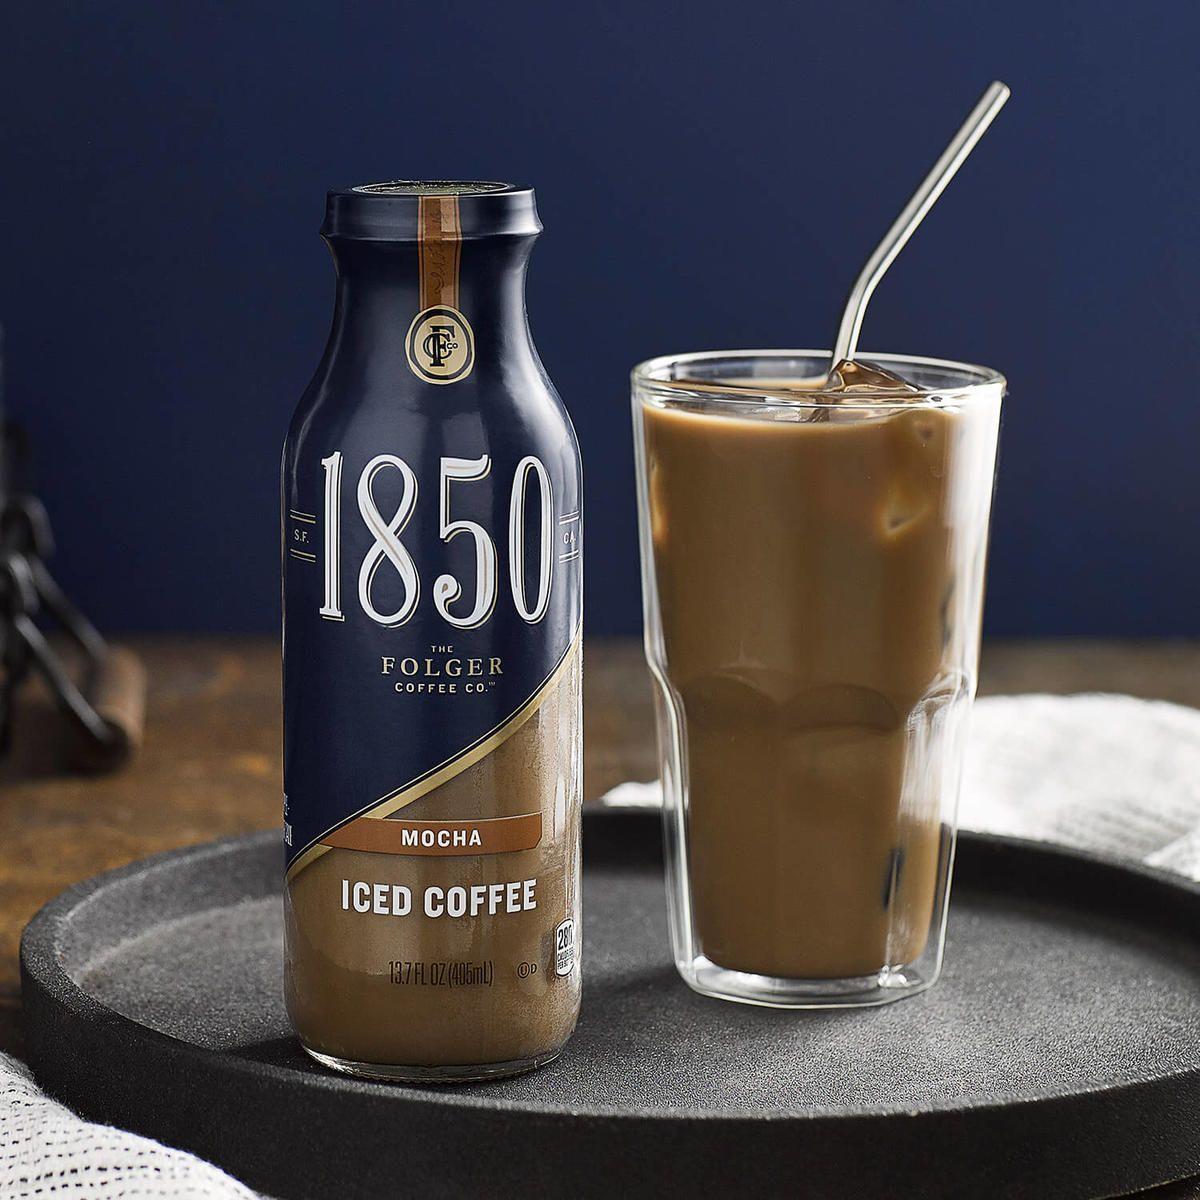 Buy again. Mocha Iced Coffee 1850 Coffee 1850 Coffee